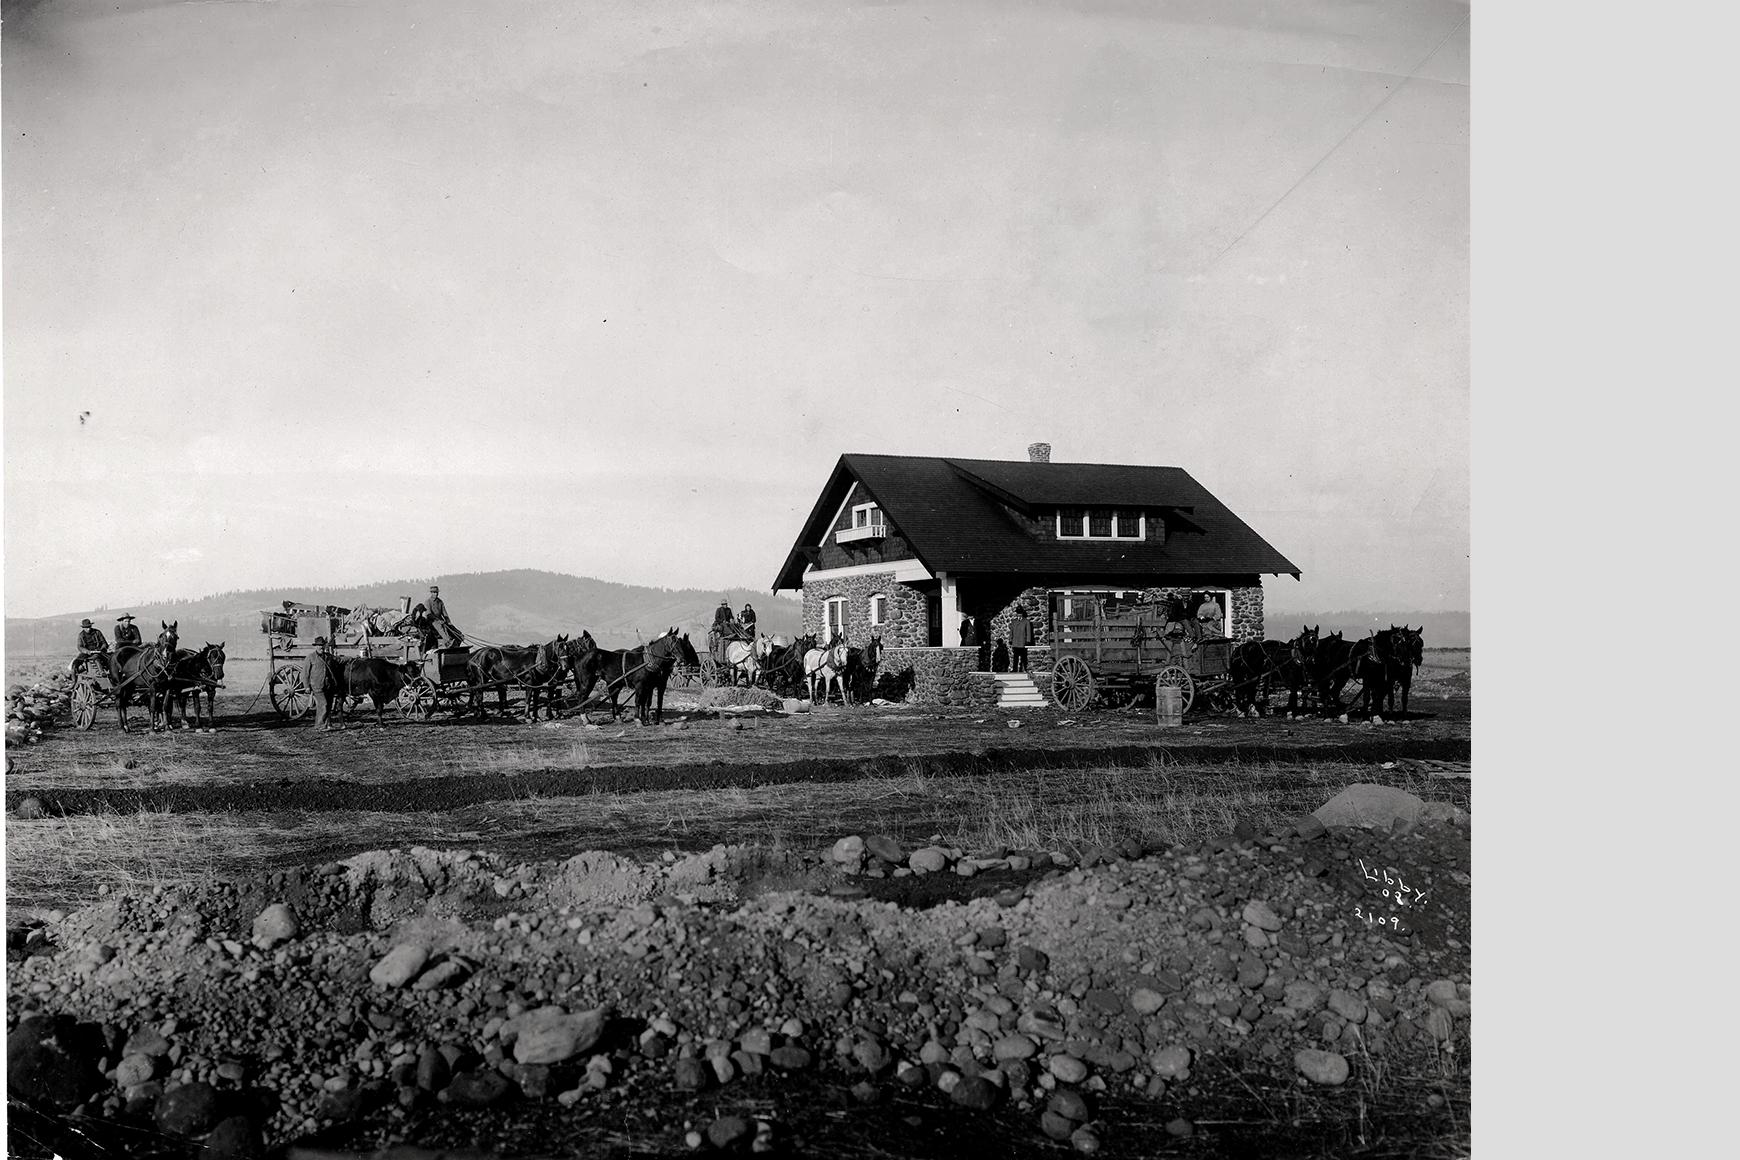 Foto Charles Libby, Spokane 1908 / Collectie Washington State Archive